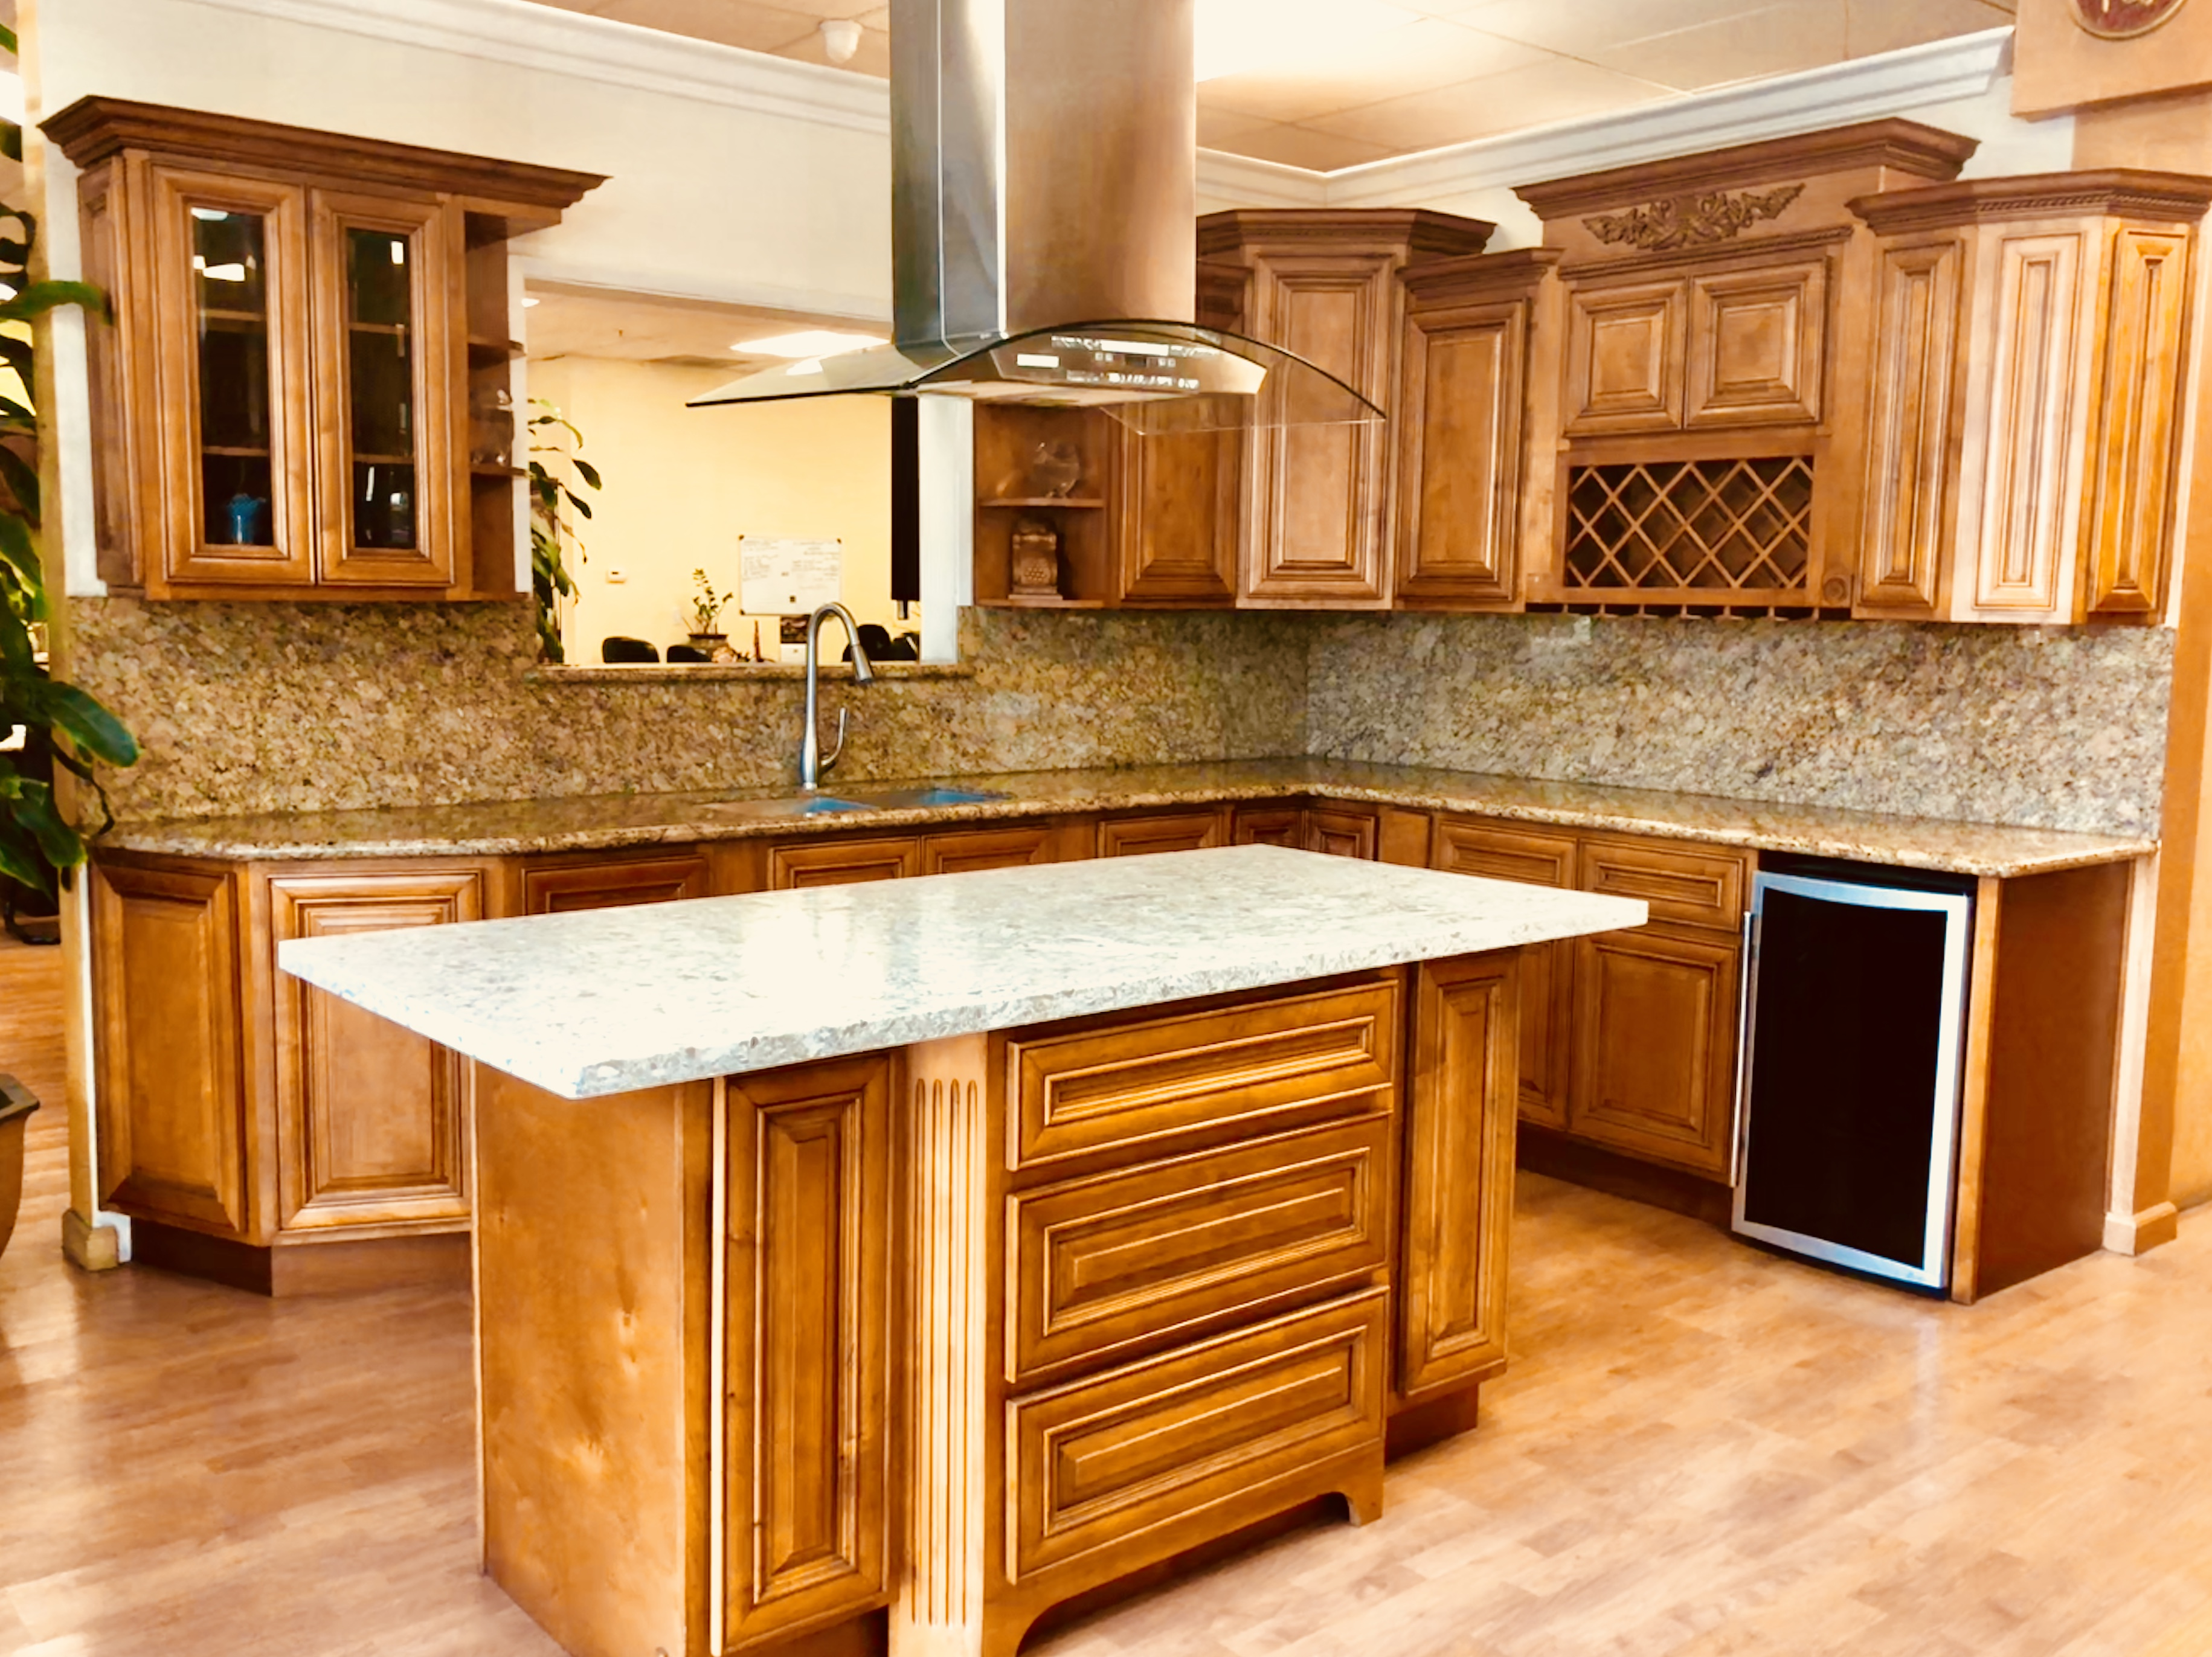 Super Deco Kitchen Cabinet Bath Inc 950 Mclaughlin Ave San Download Free Architecture Designs Scobabritishbridgeorg